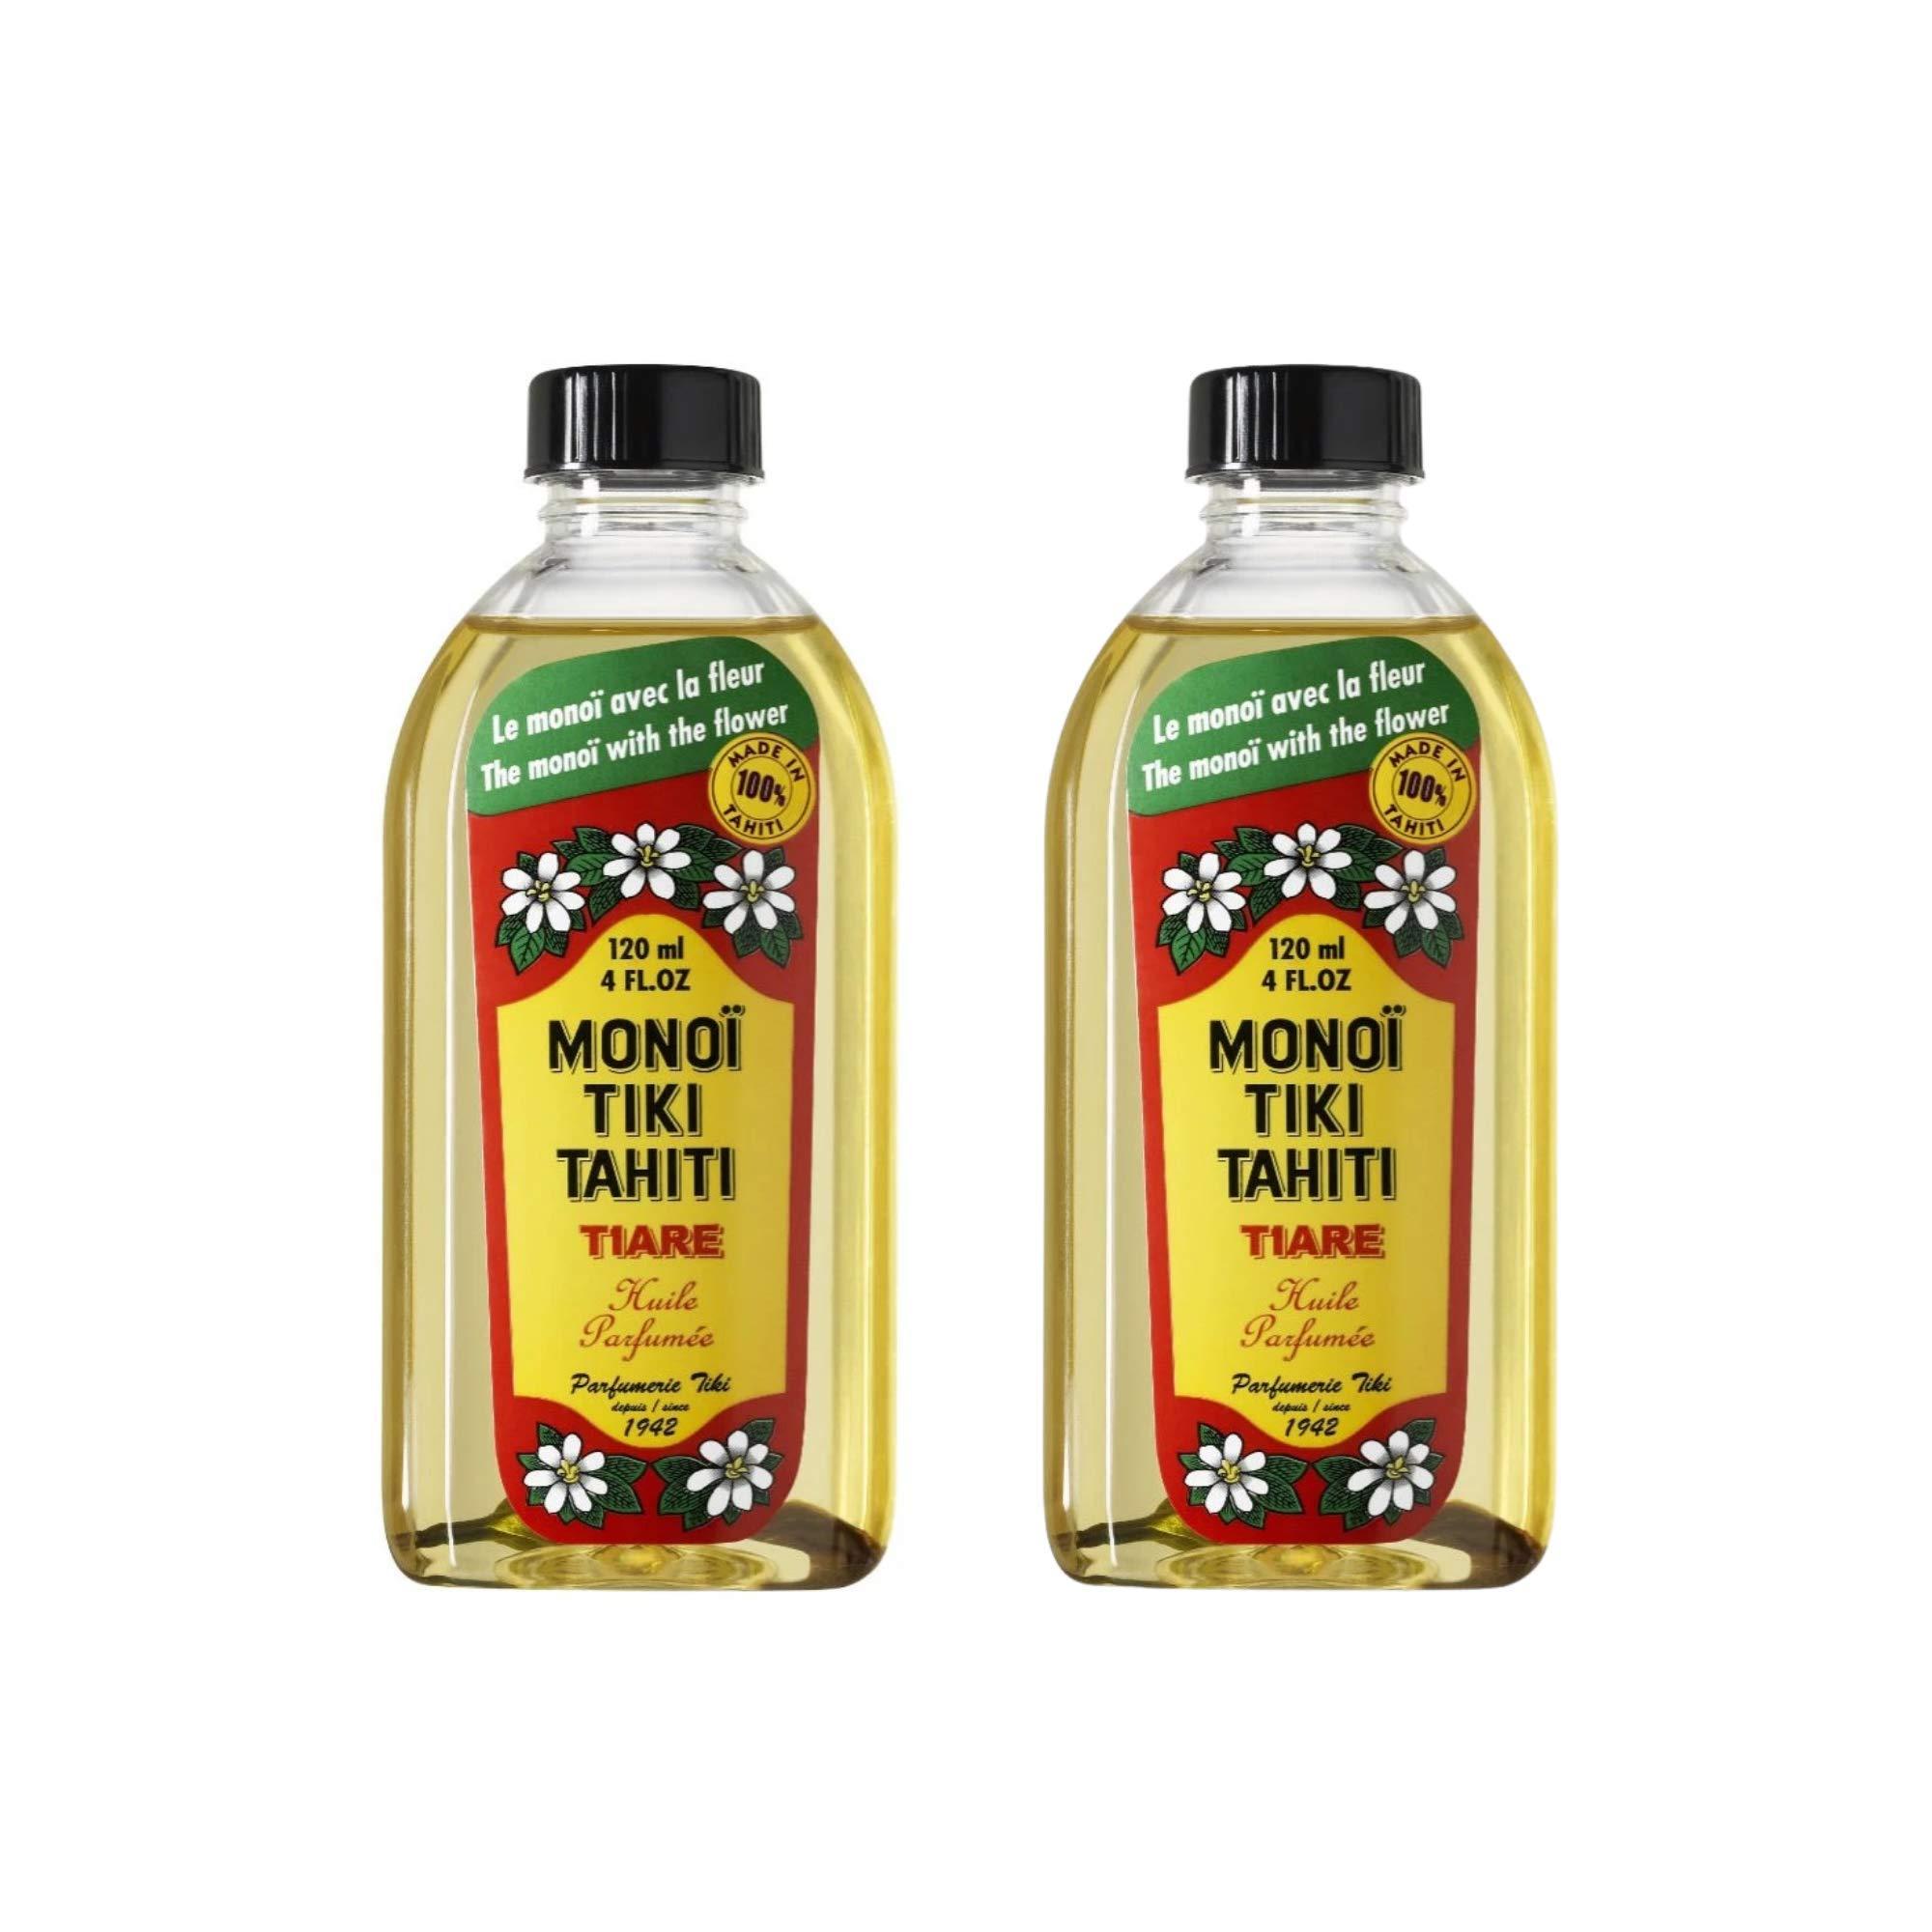 Monoi Tiki Tahiti - Tiare Coconut Oil - Original Tahitian Gardenia Fragrance - For Hydrated Skin and Hair - 4 fl. oz. (Pack of 2)